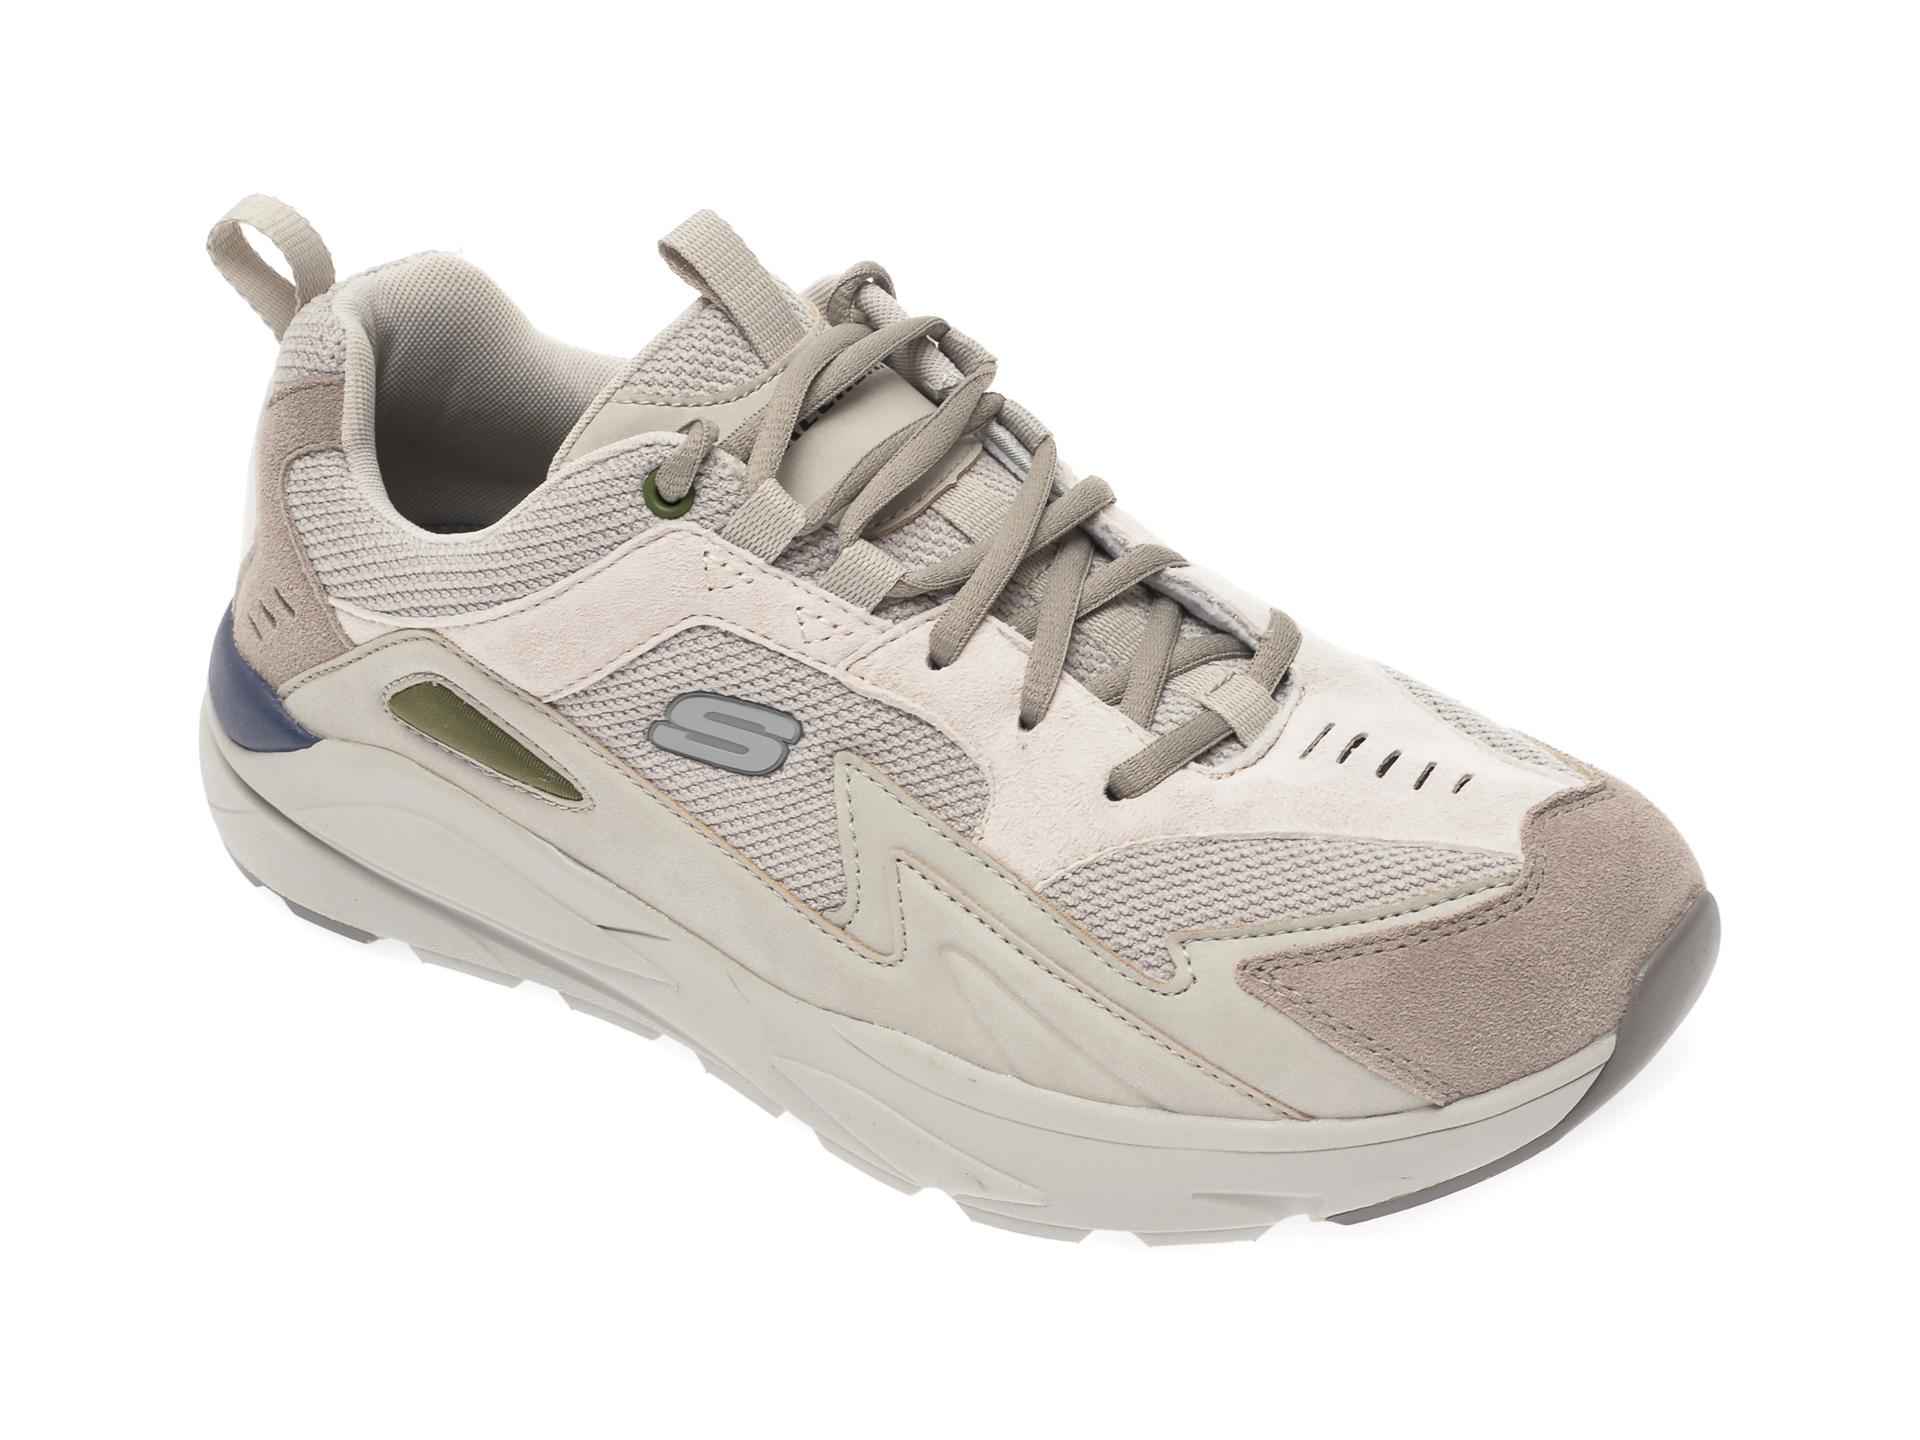 Pantofi sport SKECHERS gri, Verrado, din material textil si piele intoarsa imagine